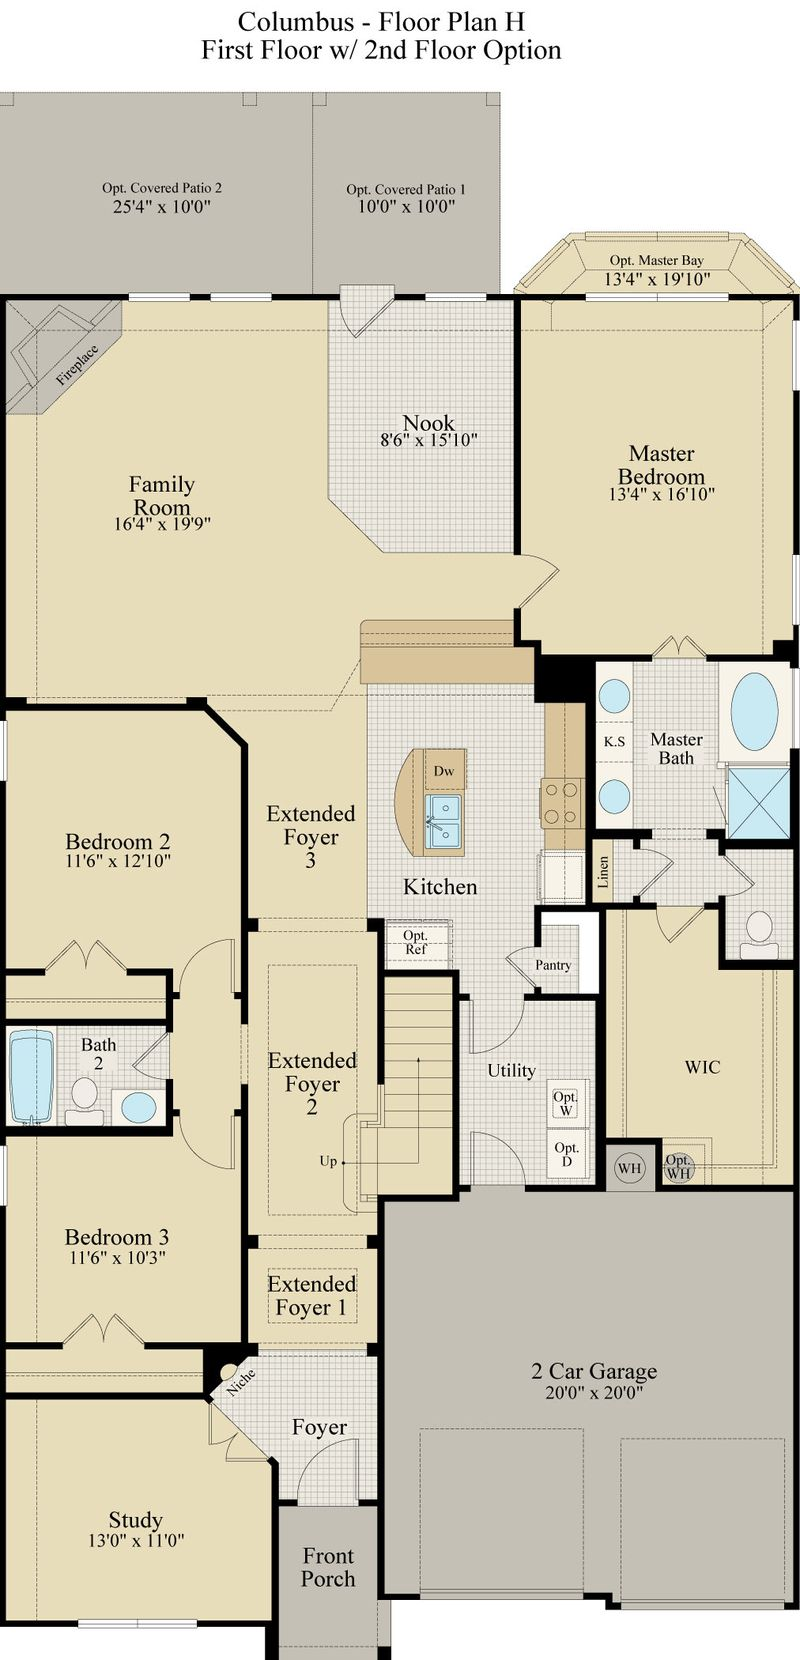 New Home Floor Plan (Columbus H) Available at John Houston Custom Homes